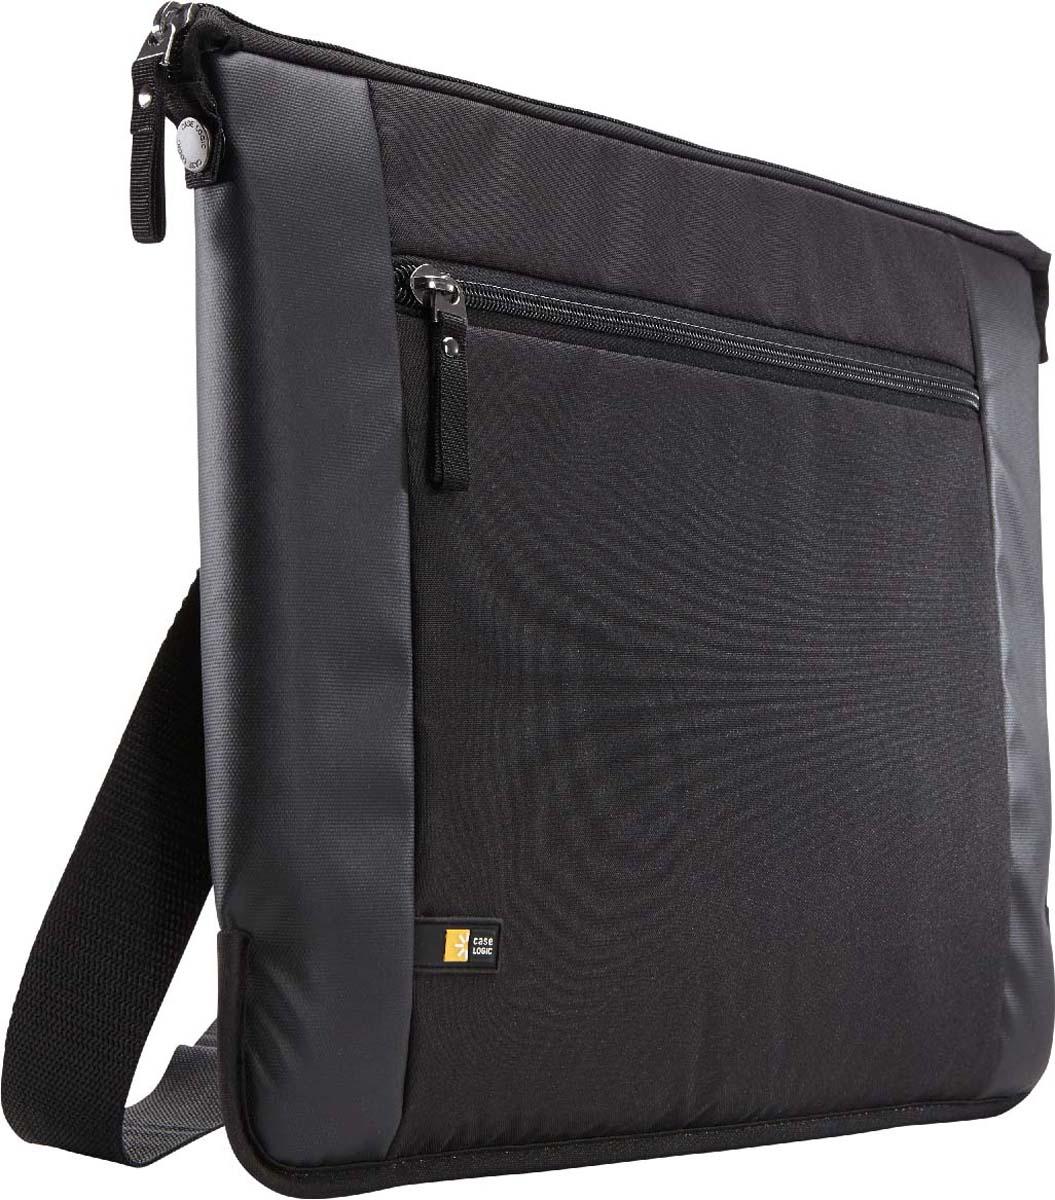 Case Logic Intrata Slim Black, сумка для ноутбука 15,6